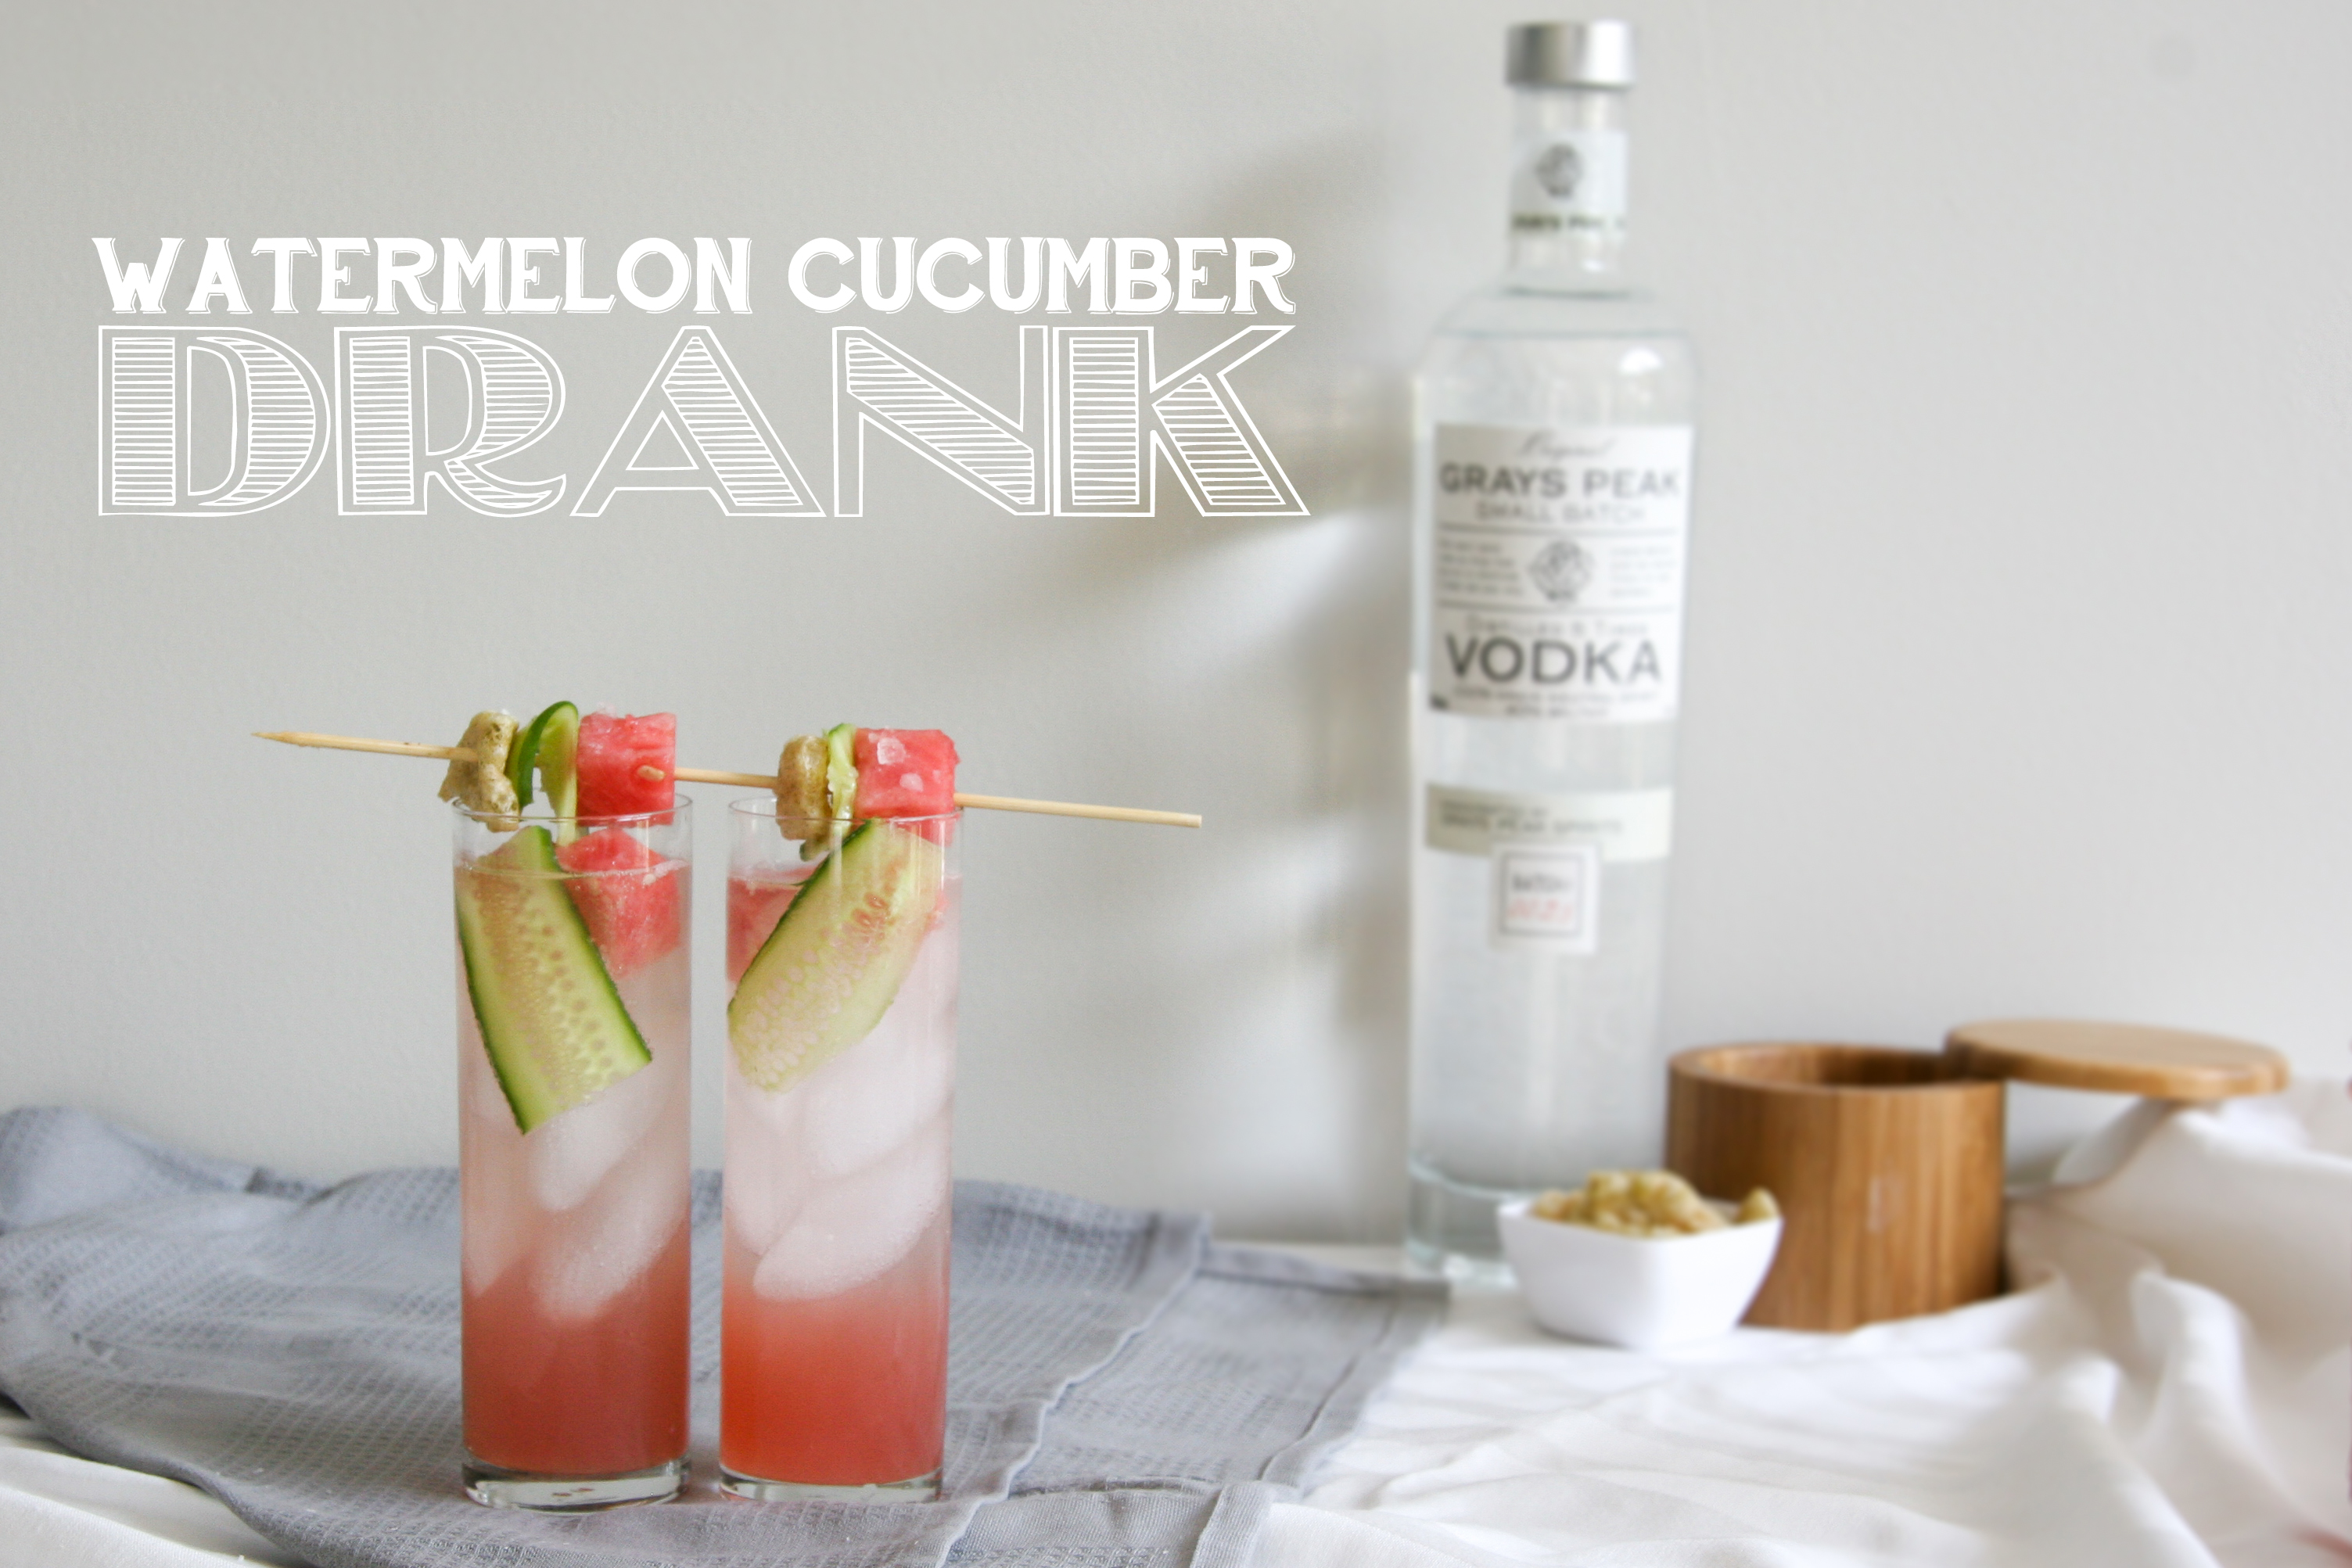 Watermelon Cucumber Drank